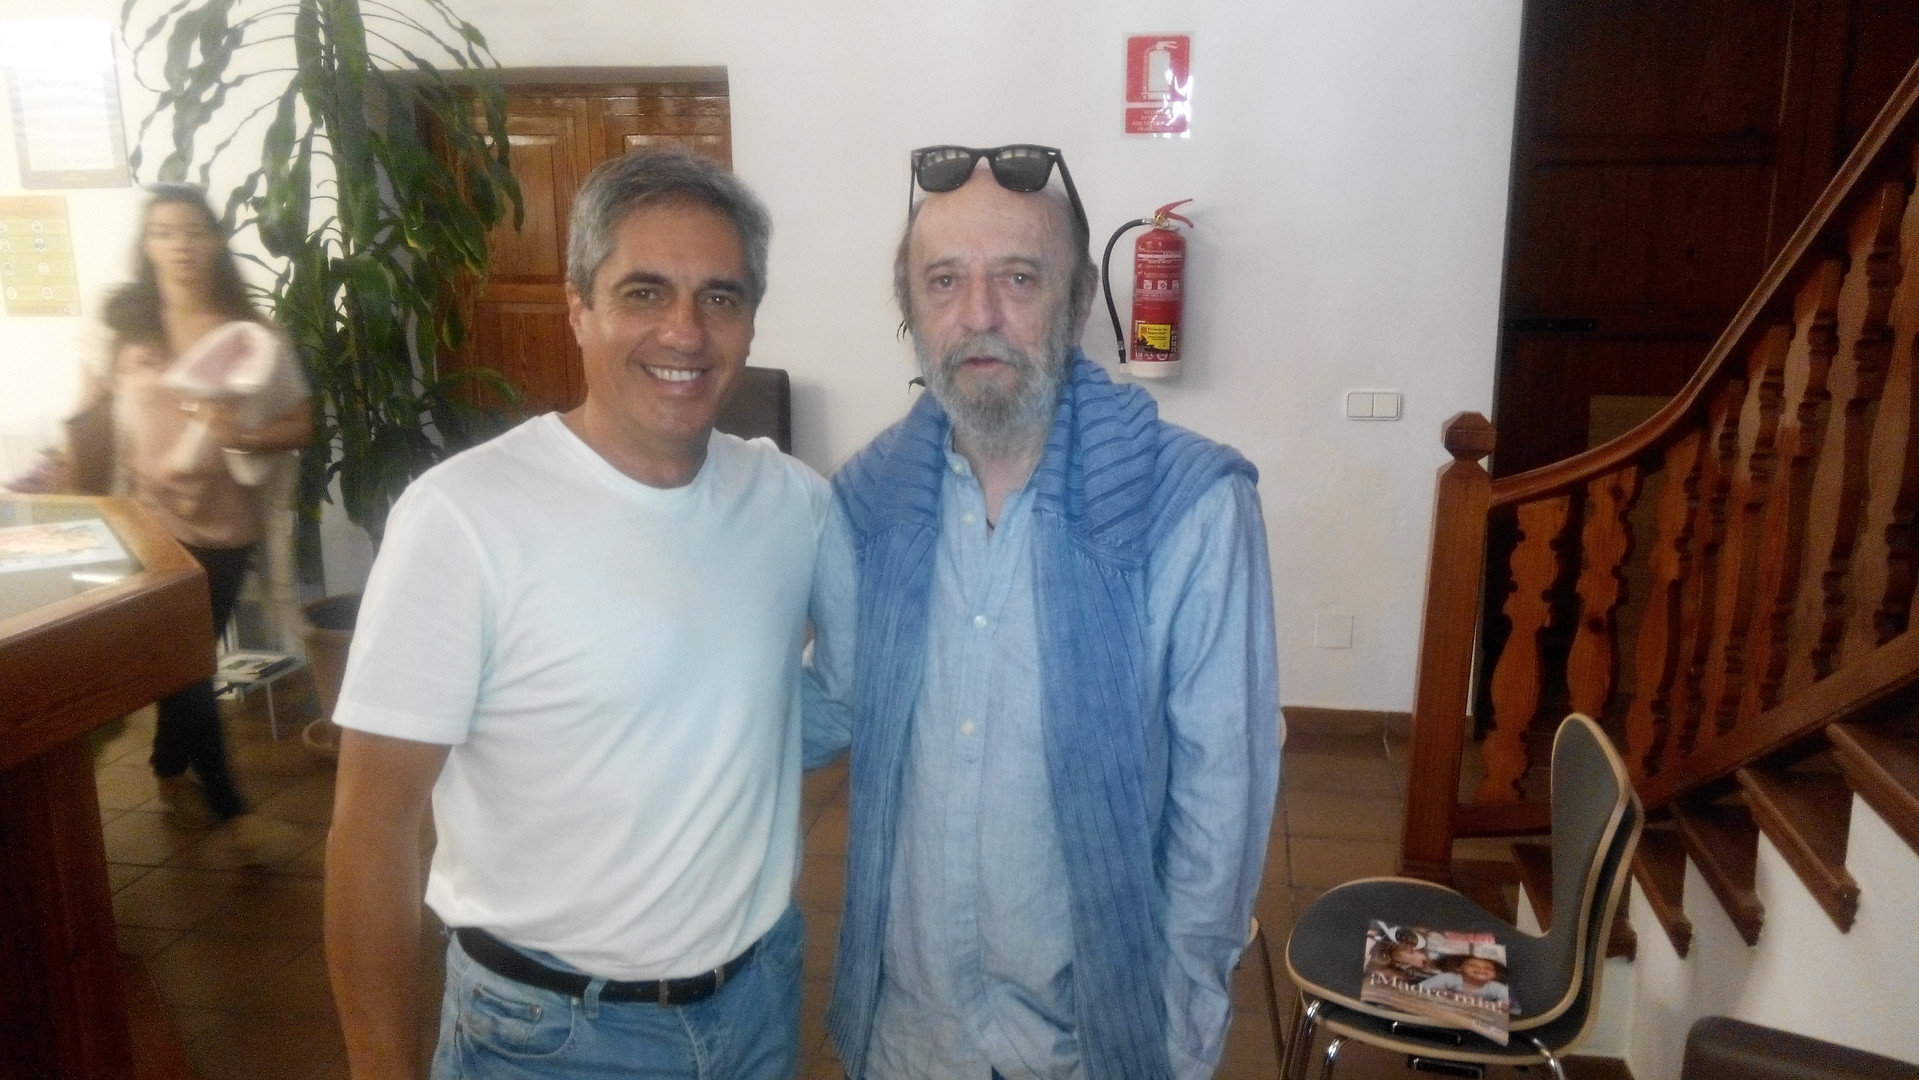 2017-05-06 - ANDRES ABERASTURI Y AGUSTIN